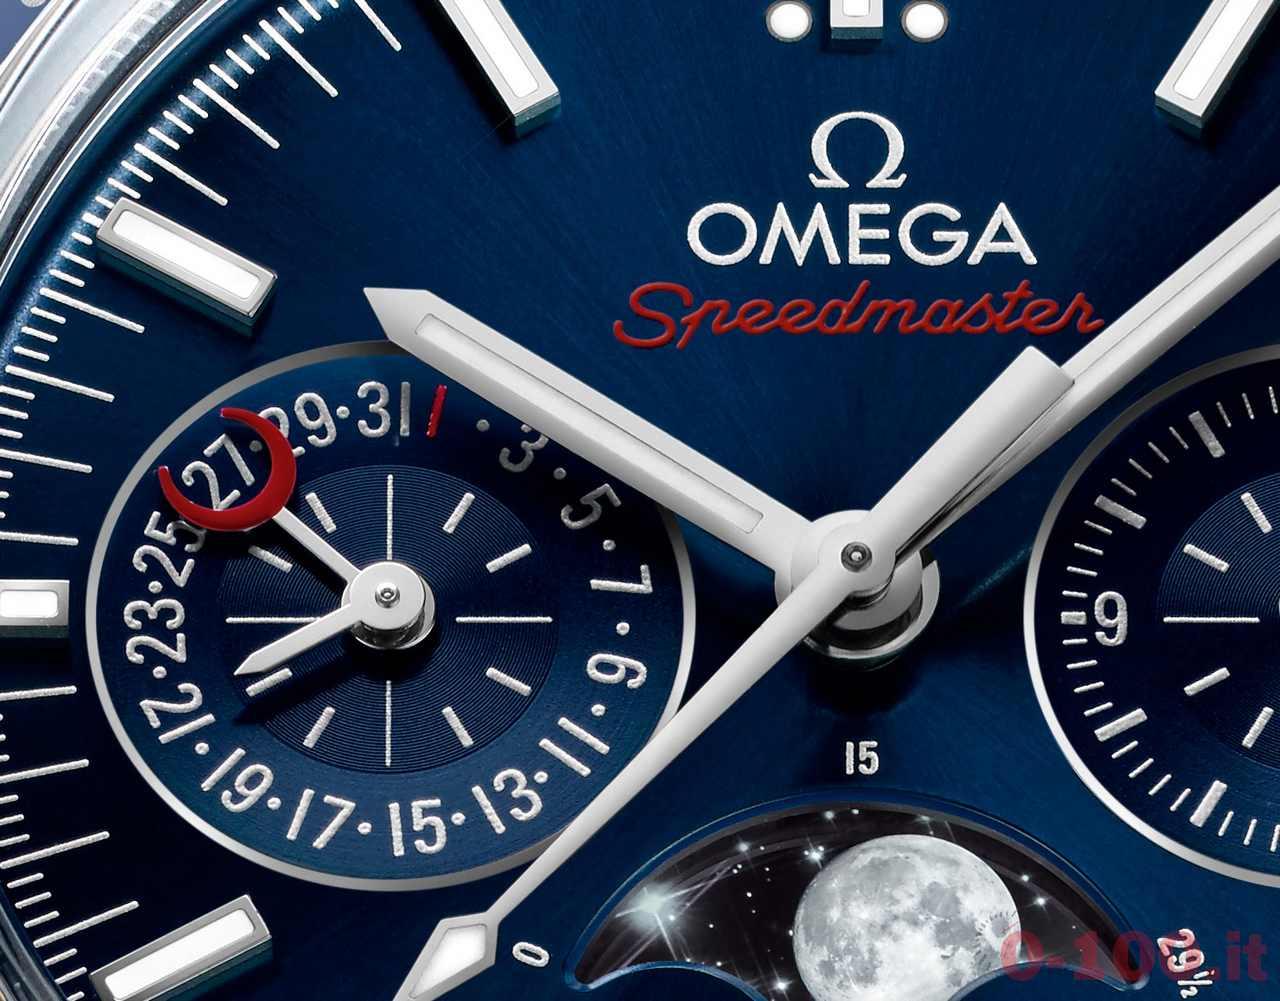 baselworld-2016-omega-speedmaster-moonphase-master-chronometer-ref-304-33-44-52-03-001_0-1004